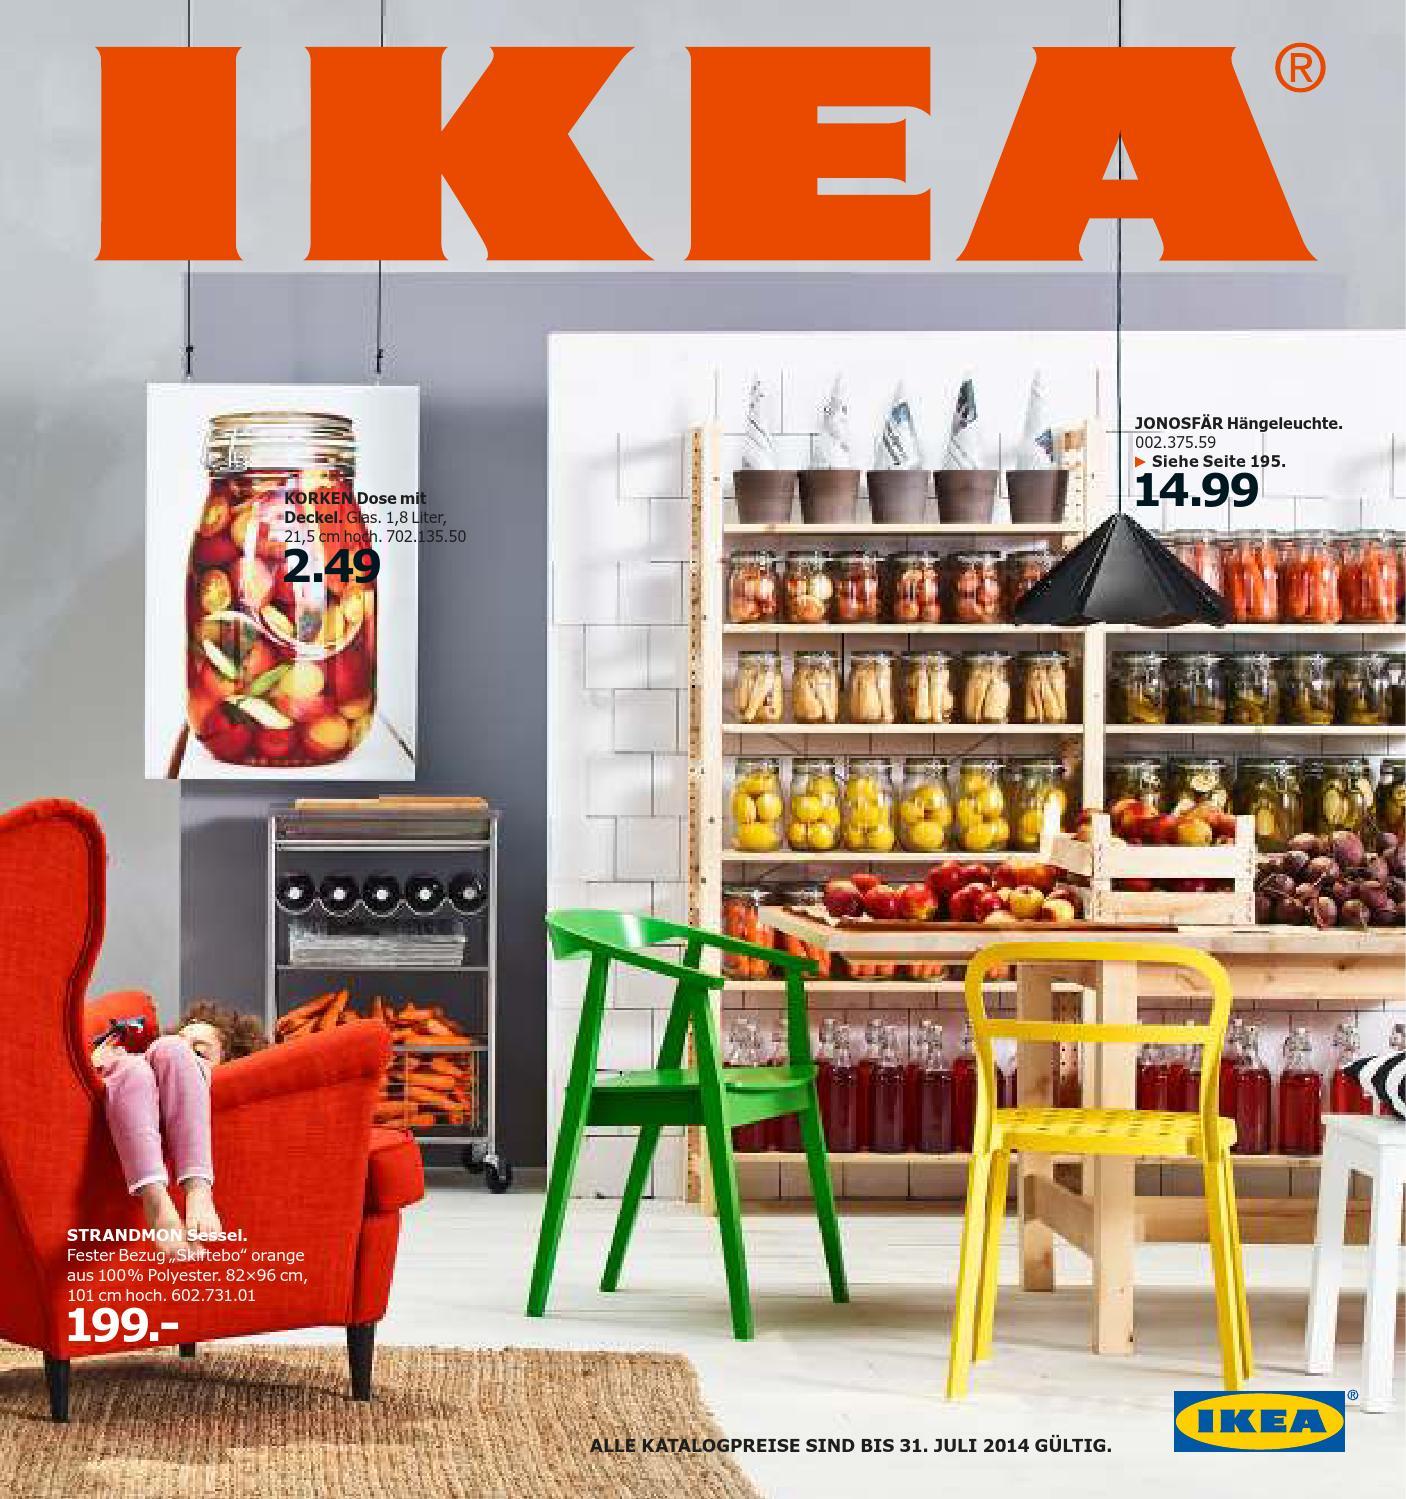 Ikea Deutschland Katalog 2013 2014 By PromoProspekte.de   Issuu